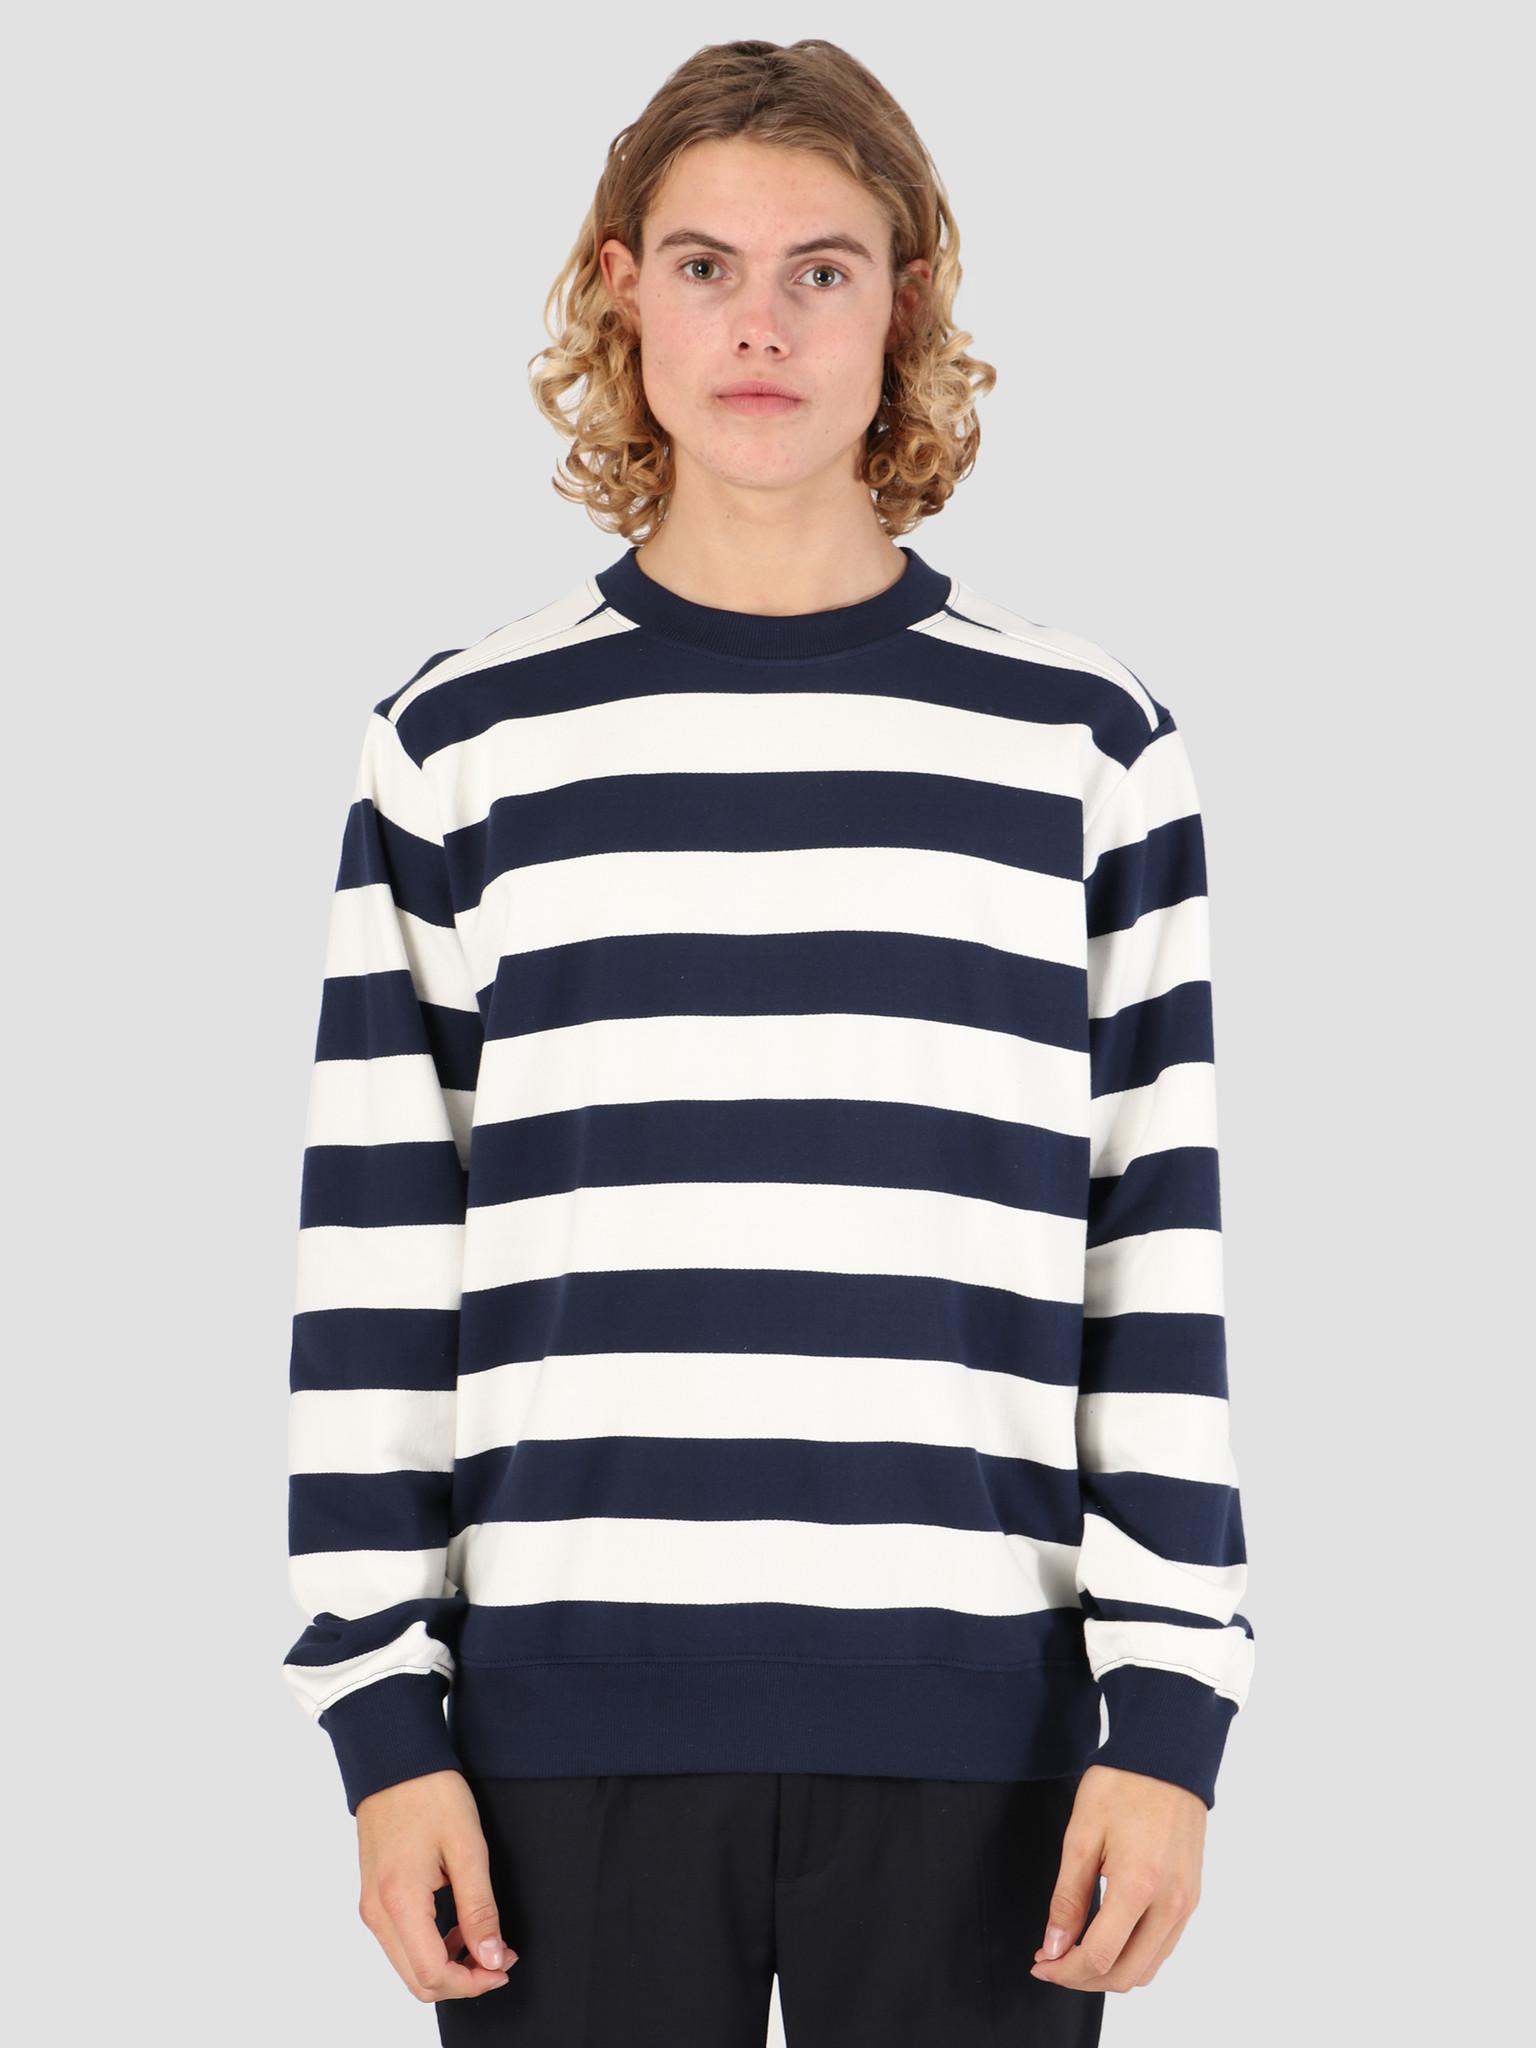 Wemoto Wemoto Crew Stripe Sweater Navy Blue 131.403-400